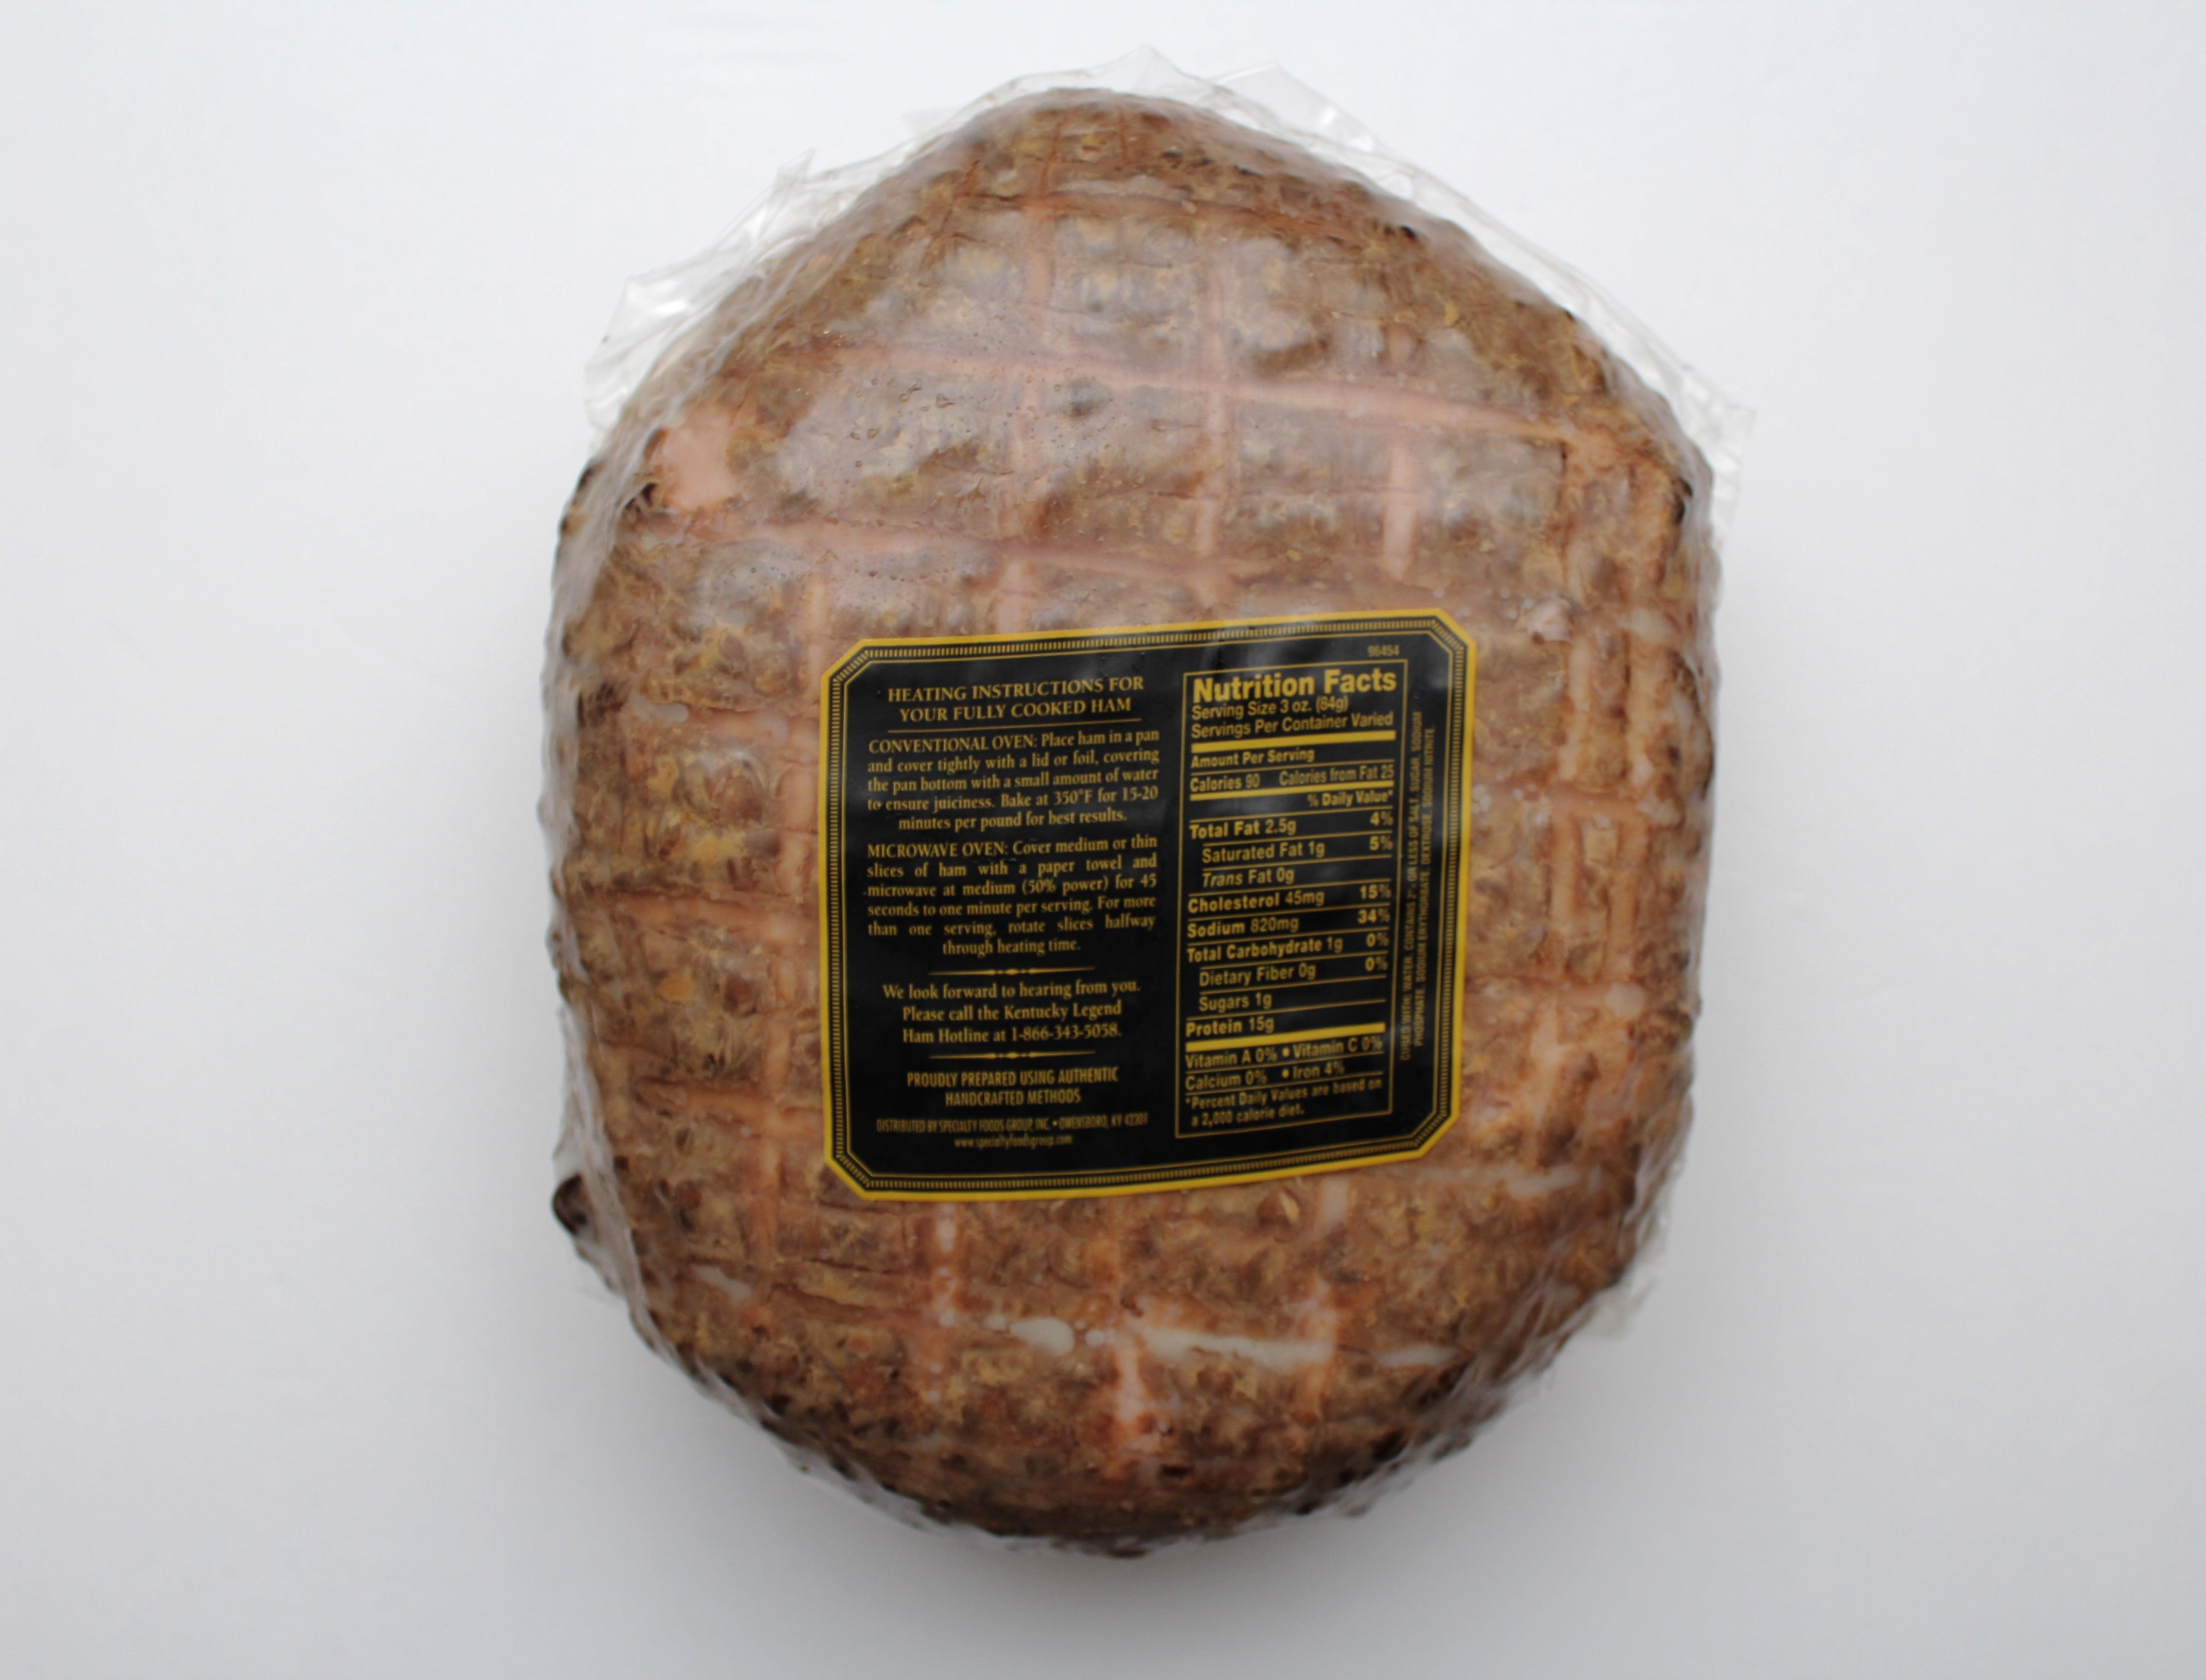 Kentucky Legend Smoked Whole Ham, 6.5- 8.5 lbs - Walmart.com